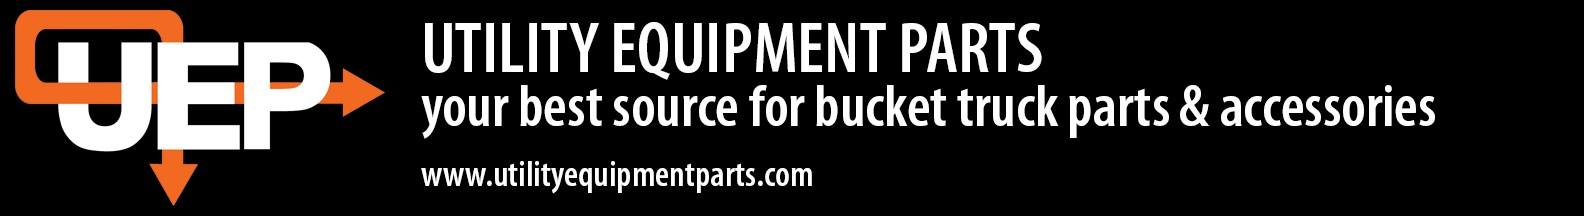 Utility Equipment Parts | LinkedIn